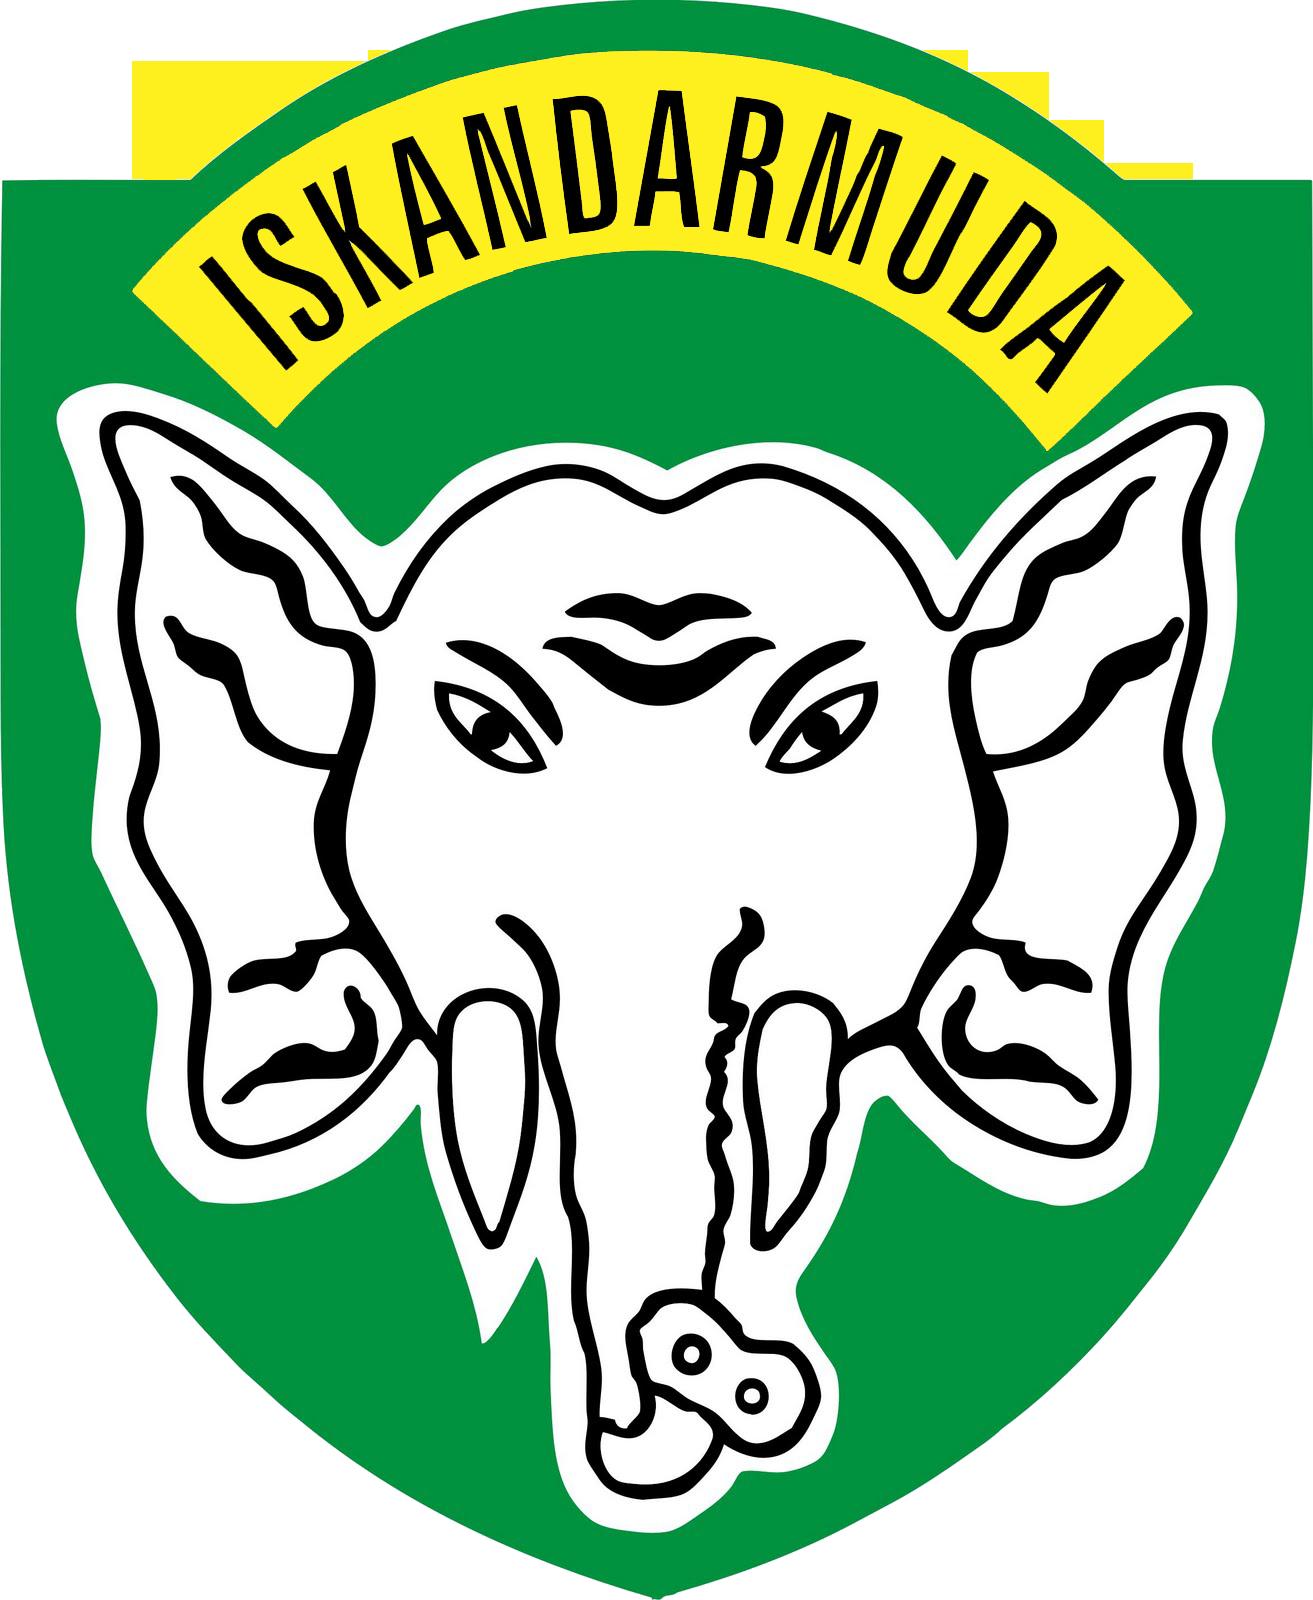 Komando Daerah Militer Iskandar Muda Wikipedia Bahasa Indonesia Ensiklopedia Bebas